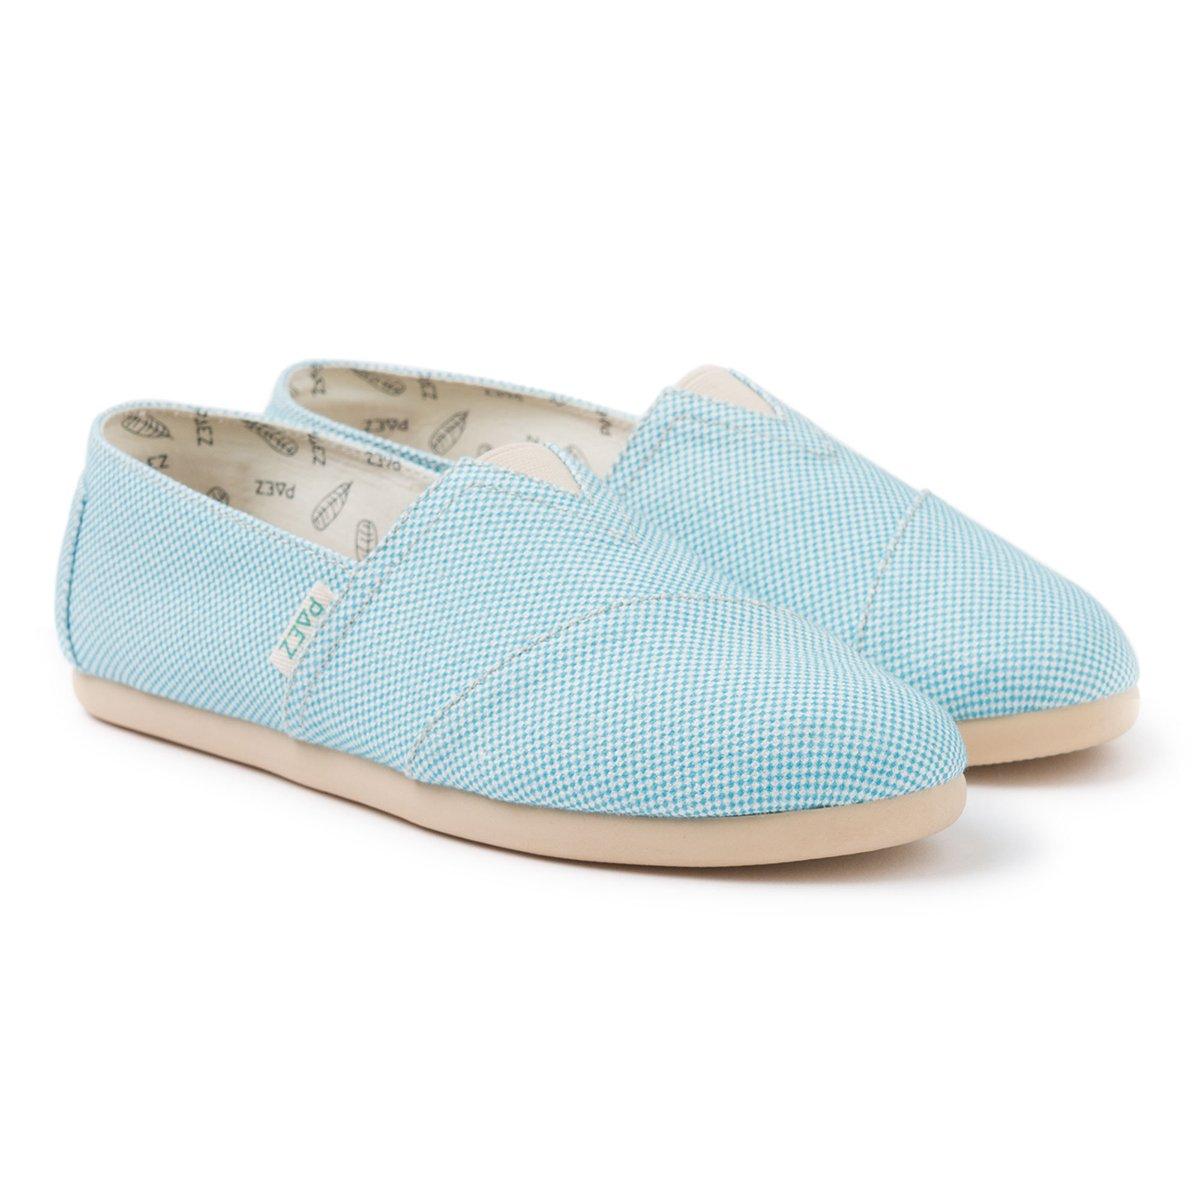 Original - Panama Blue Turquoise Woman 035 -